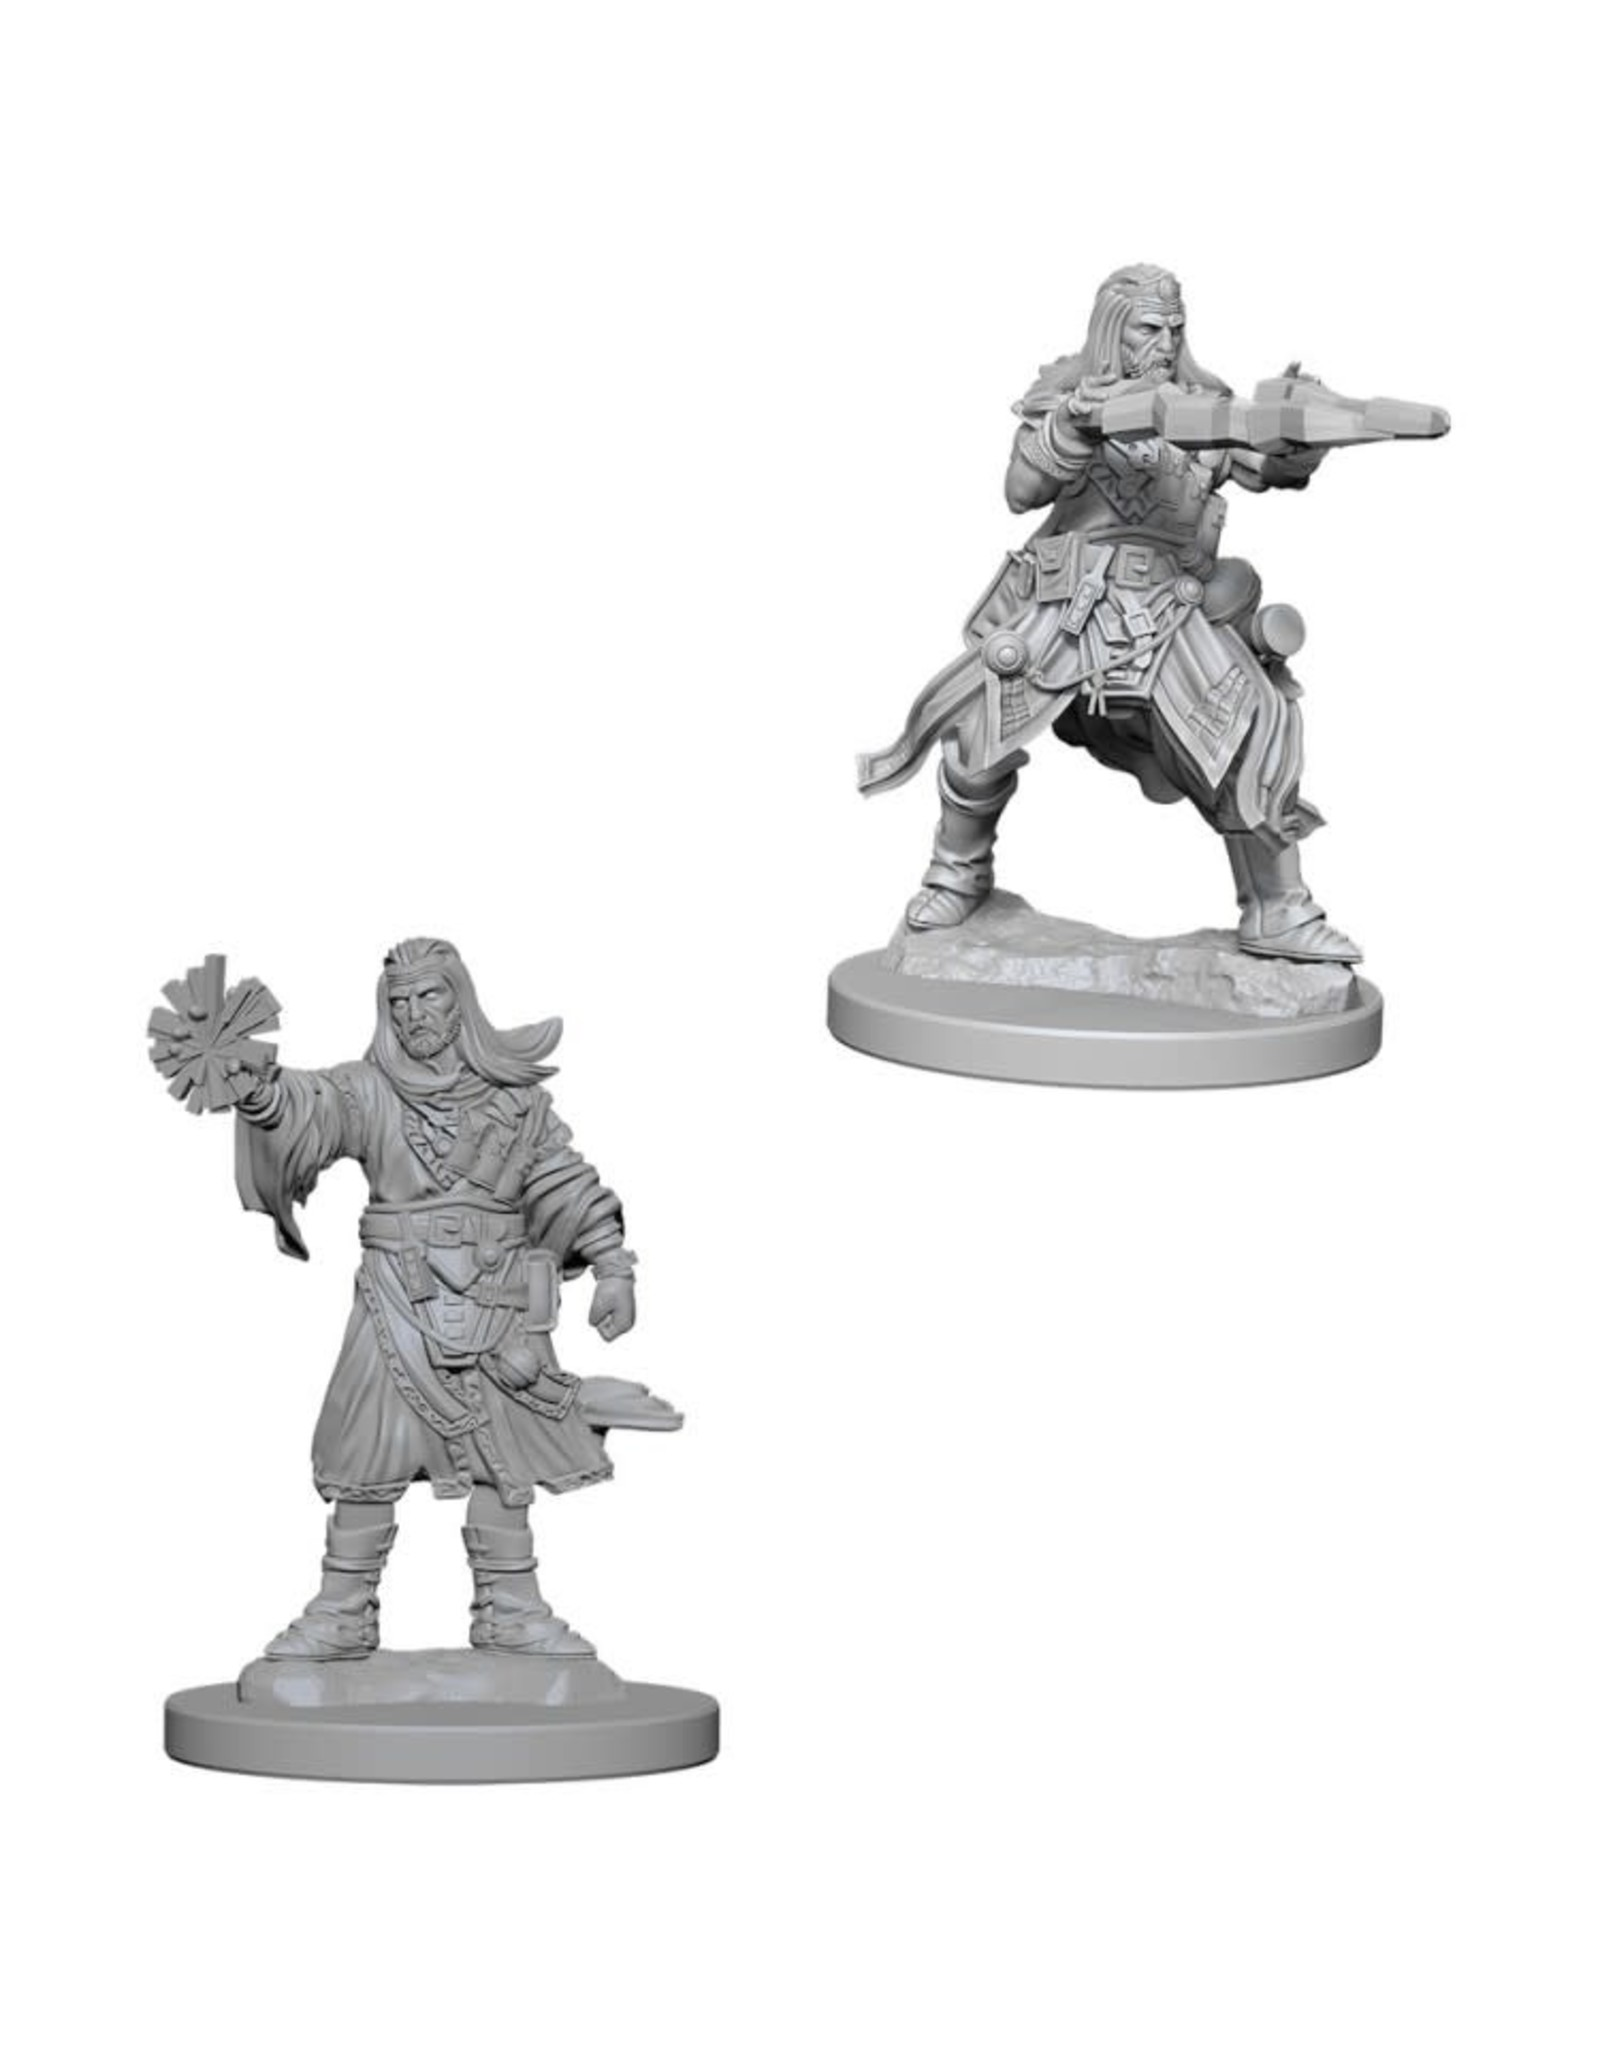 WizKids Pathfinder Minis (unpainted): Human Wizard (male) Wave 6, 73411